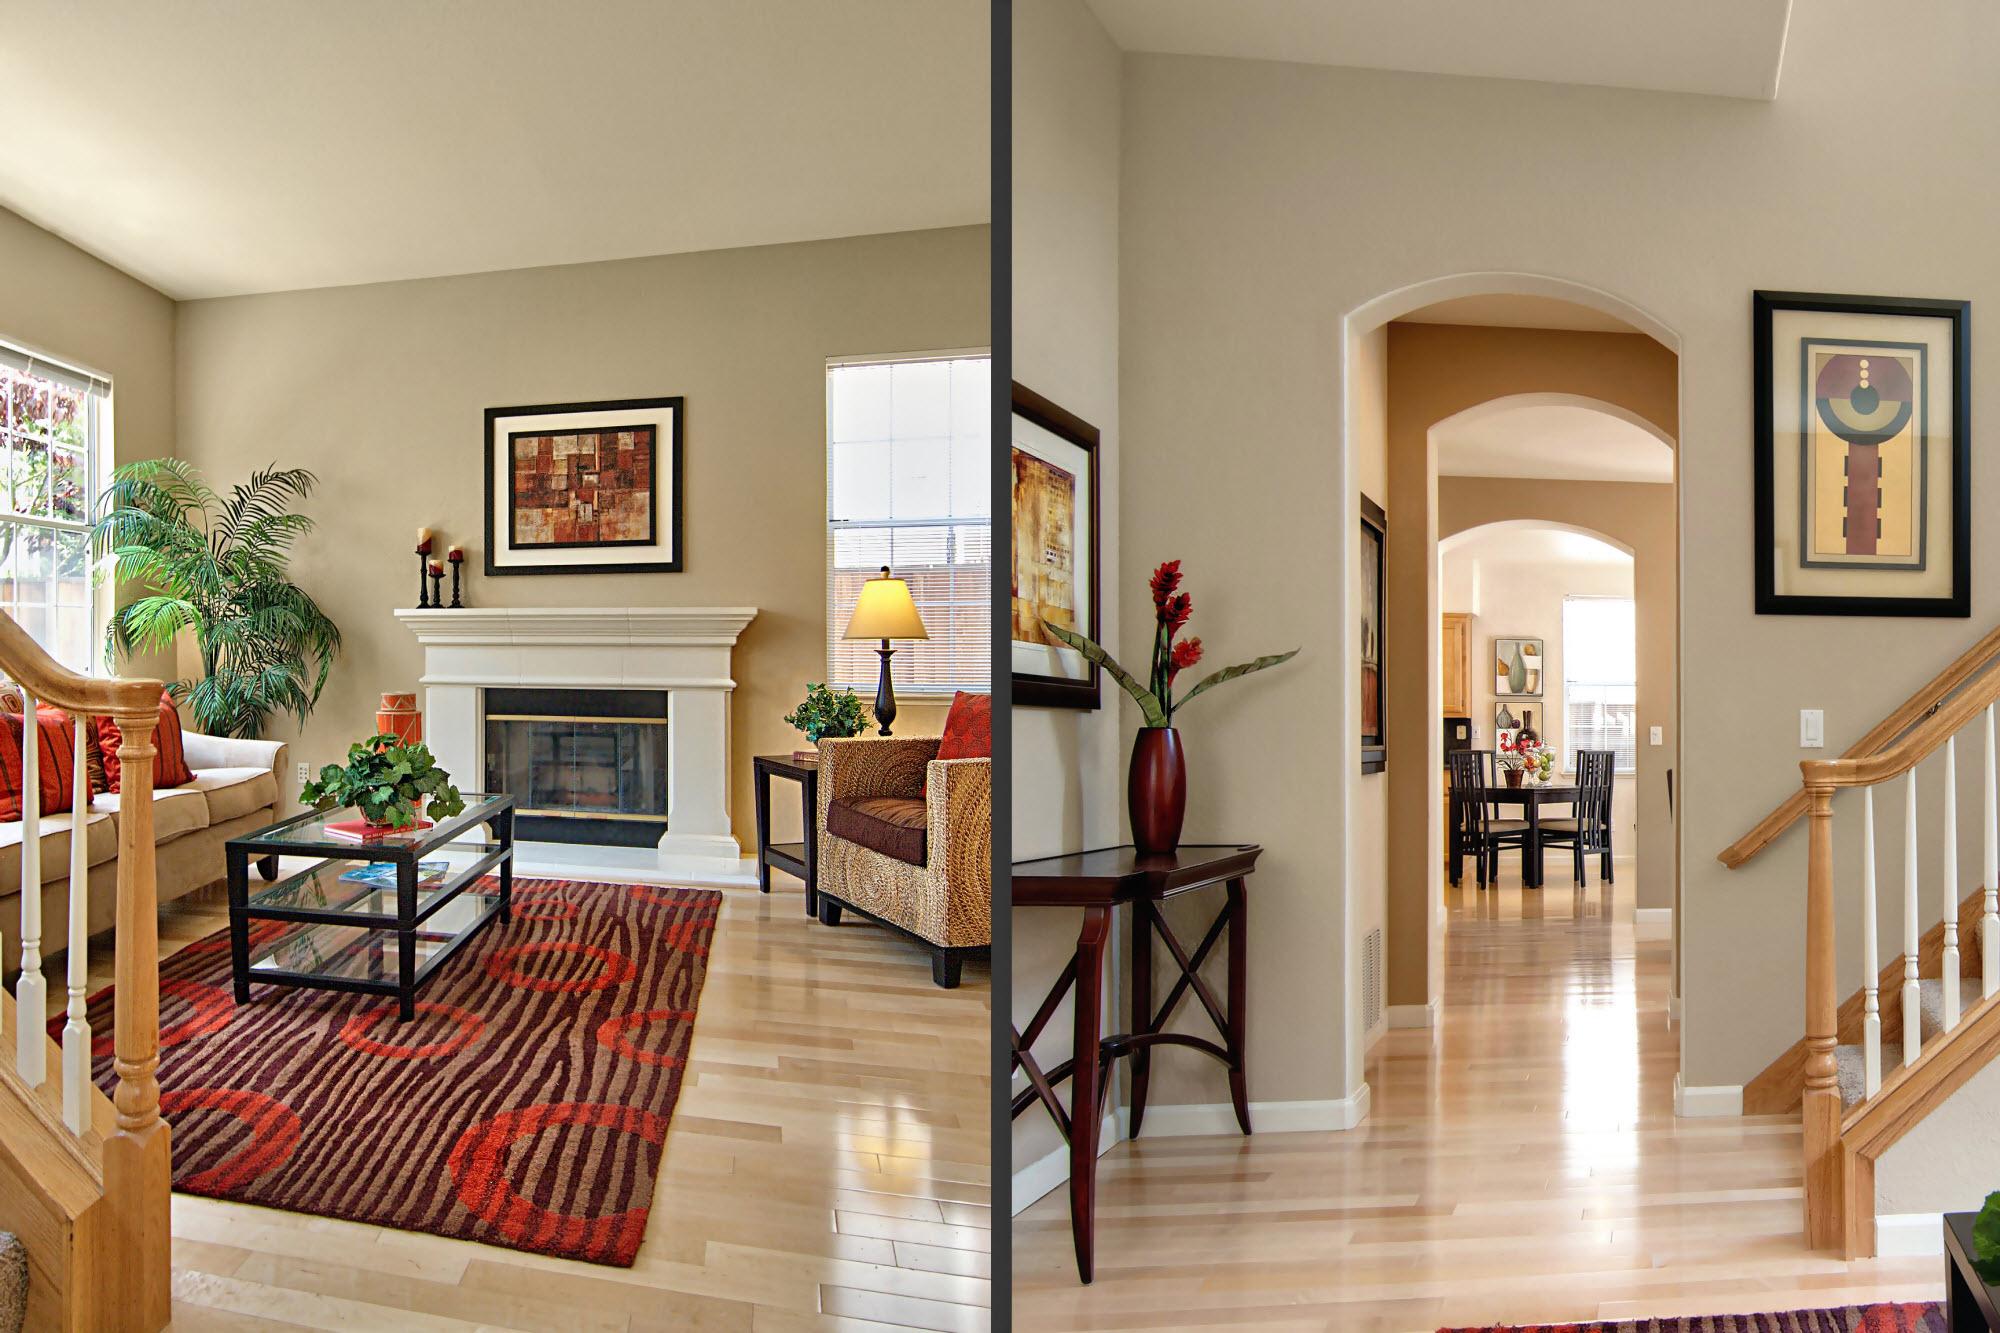 Living+Room+II-957894719-O-1085127755-O.jpg